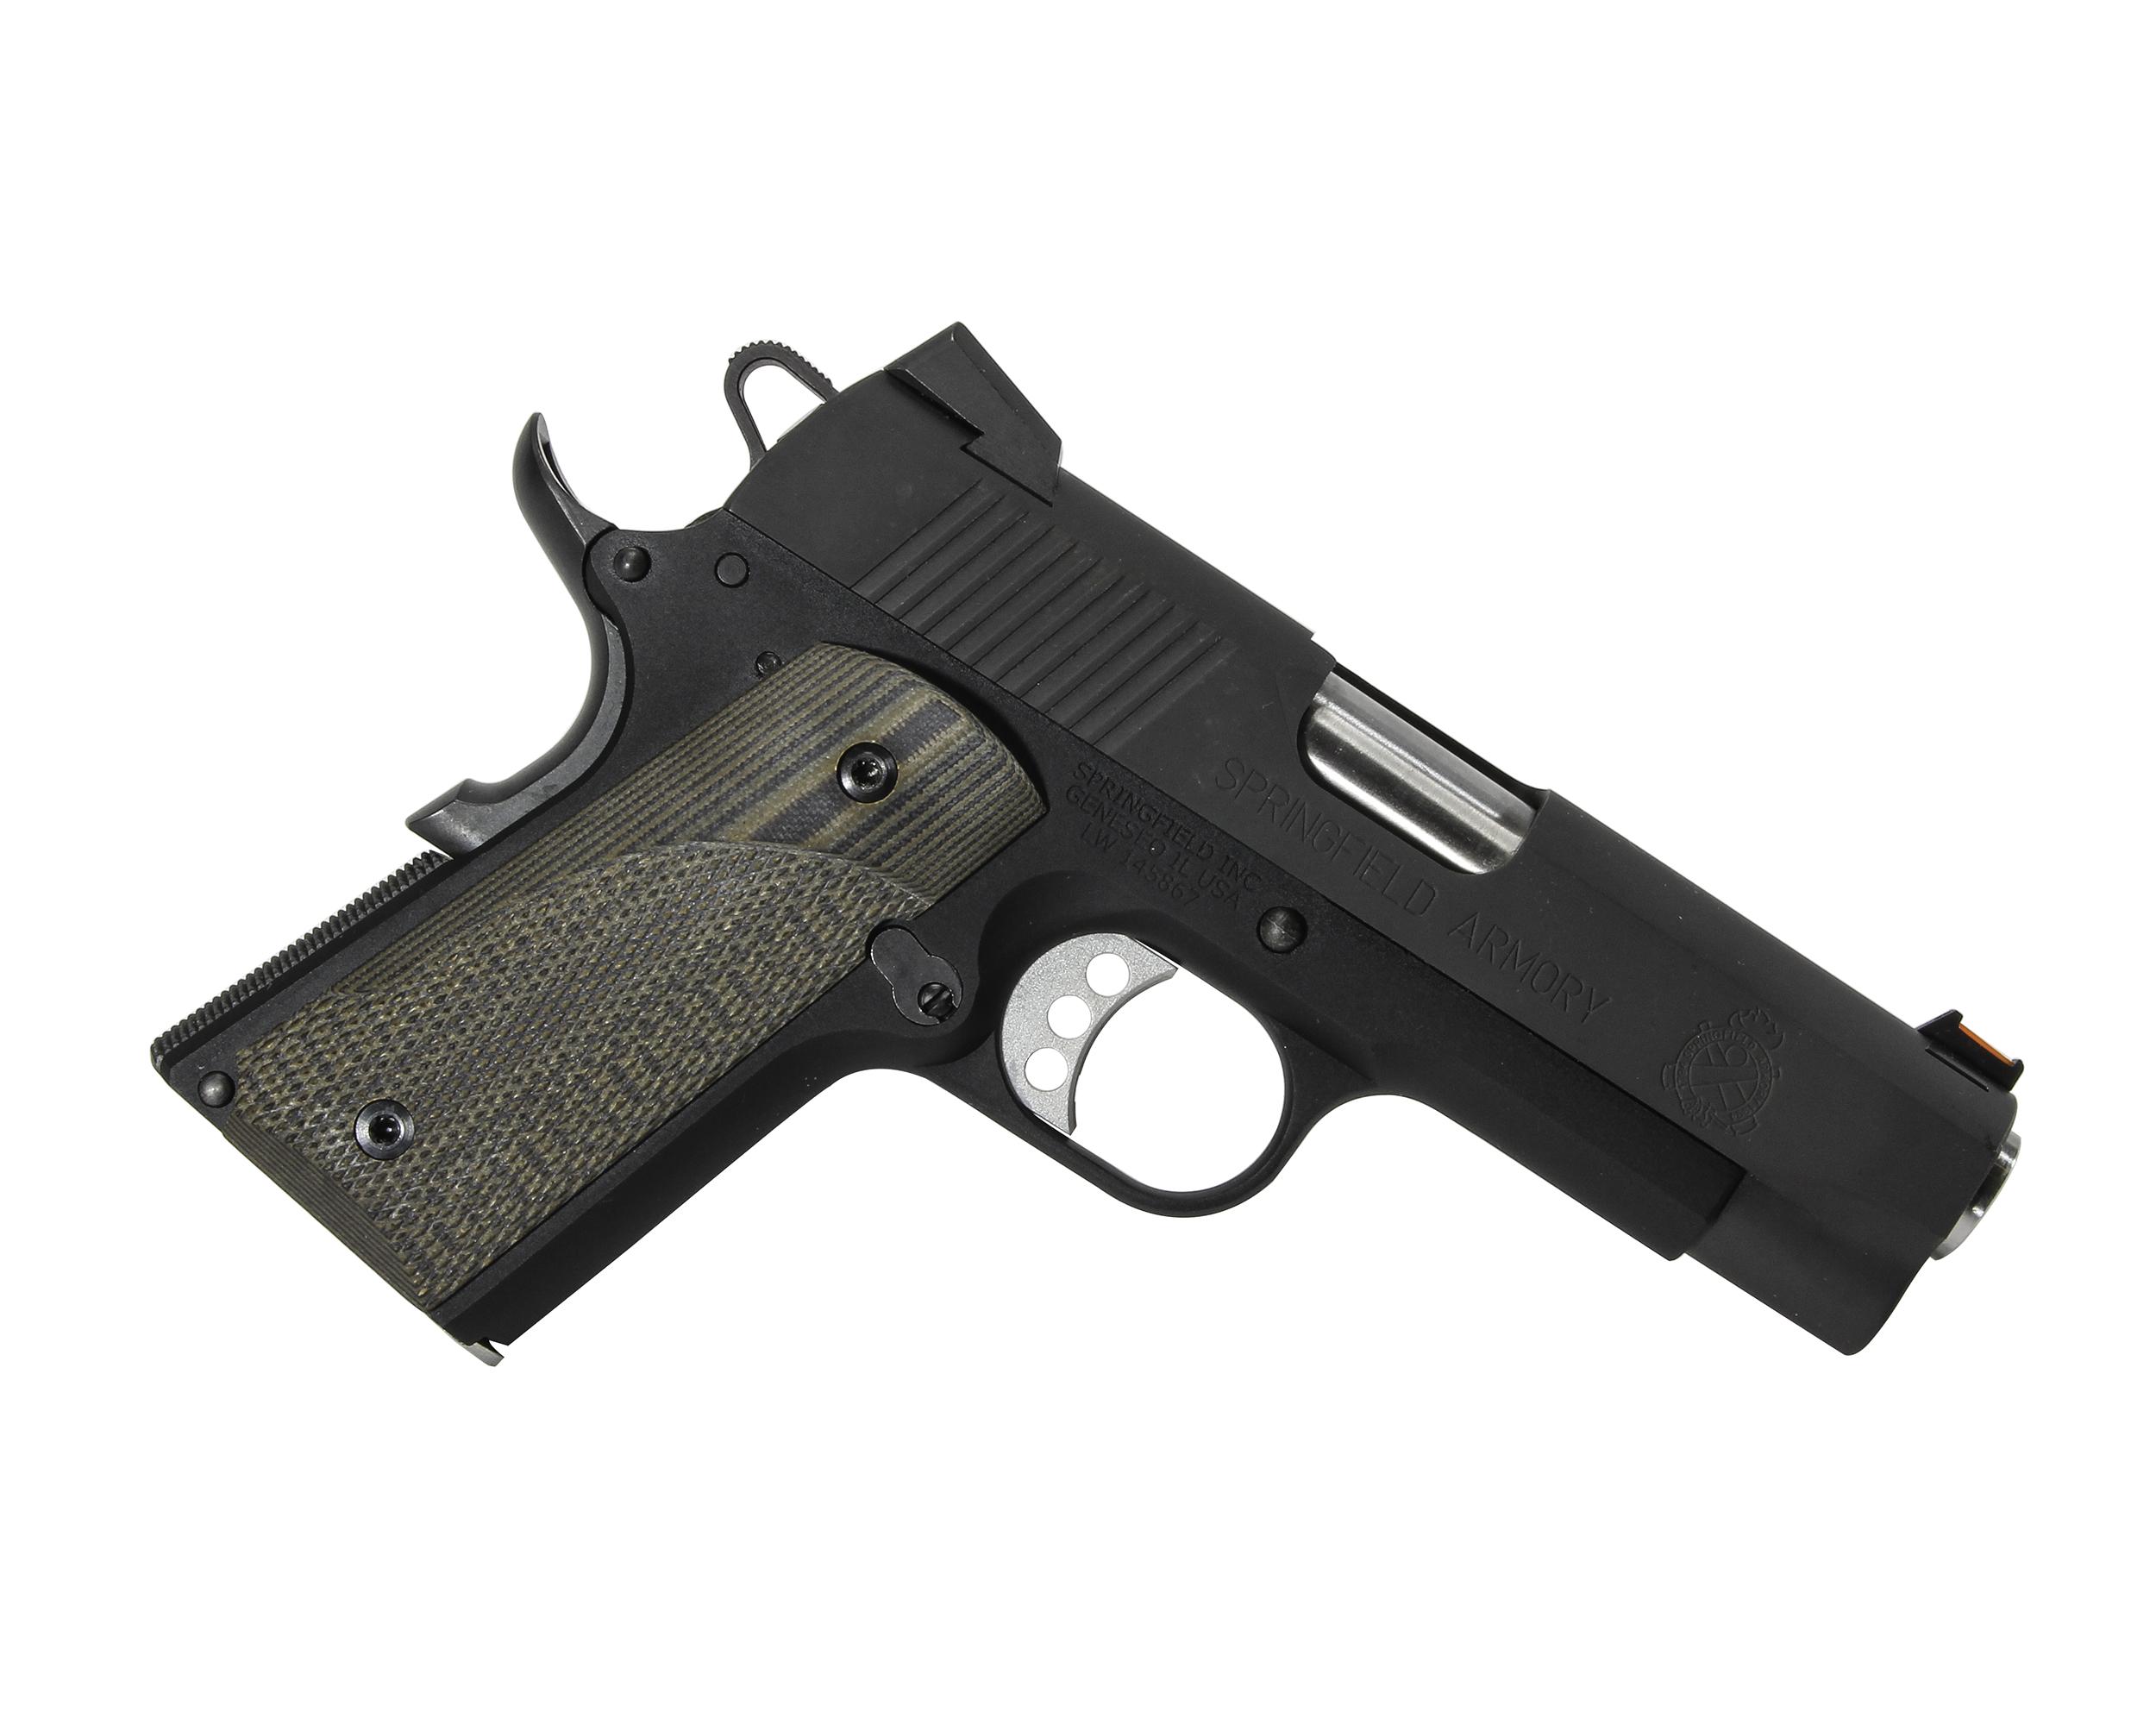 Pachmayr 1911 Officer G10 Firearm Grip